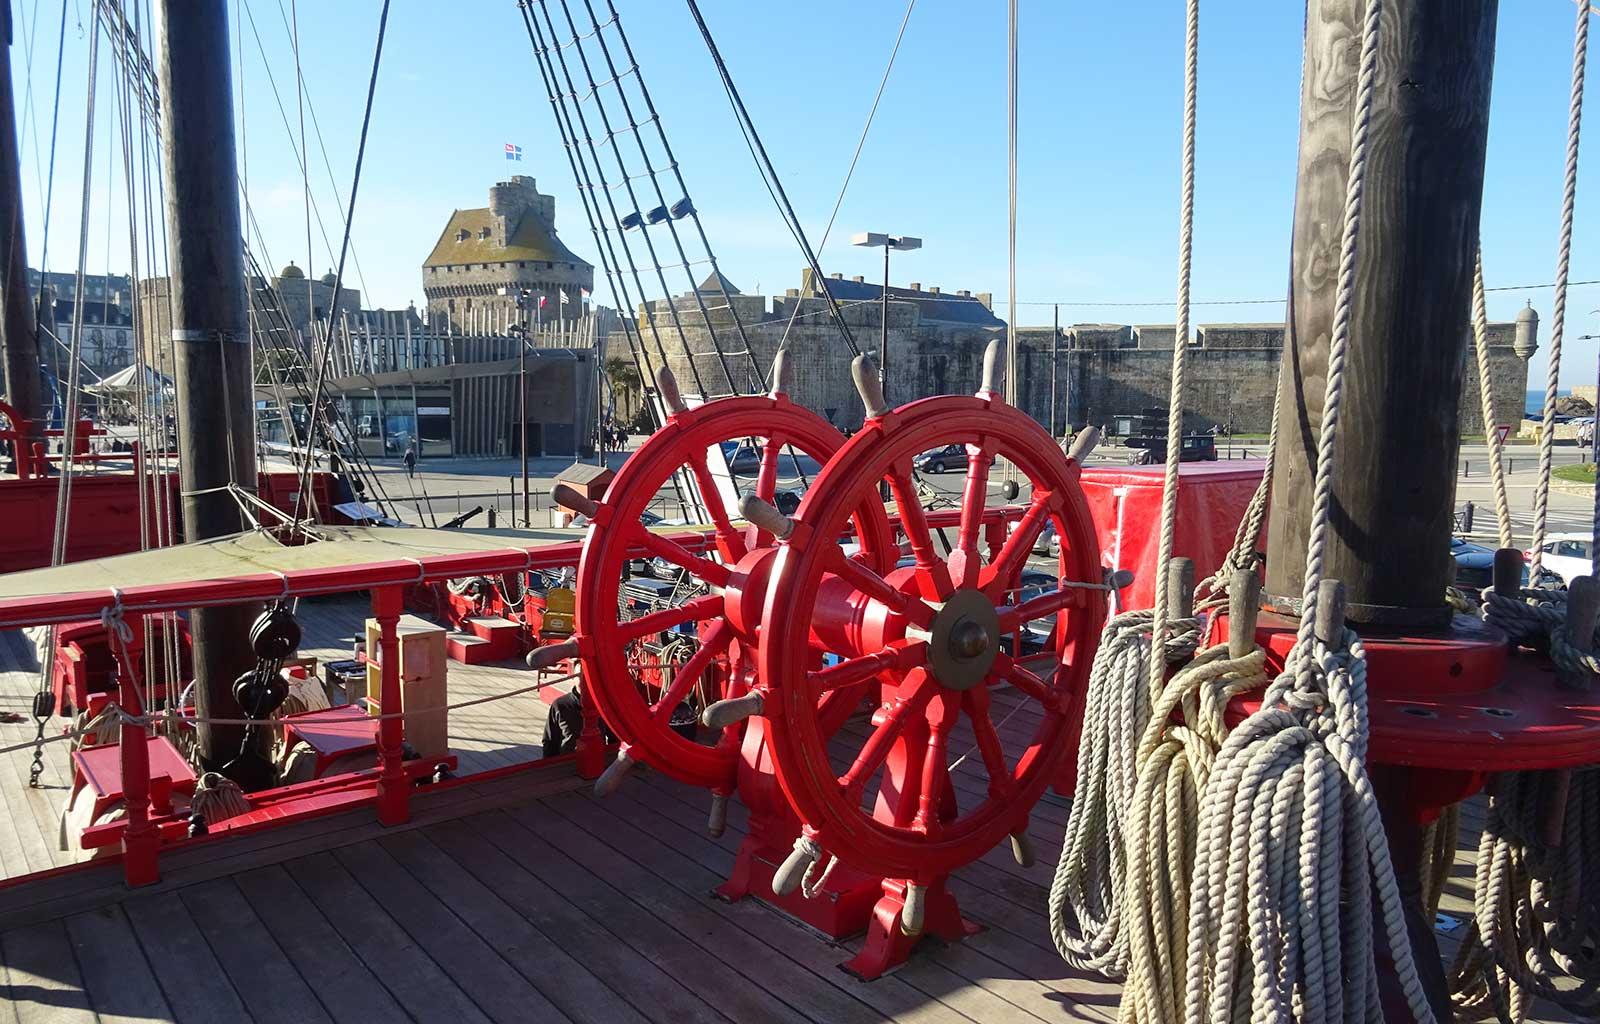 City Guide Saint Malo etoile du roy